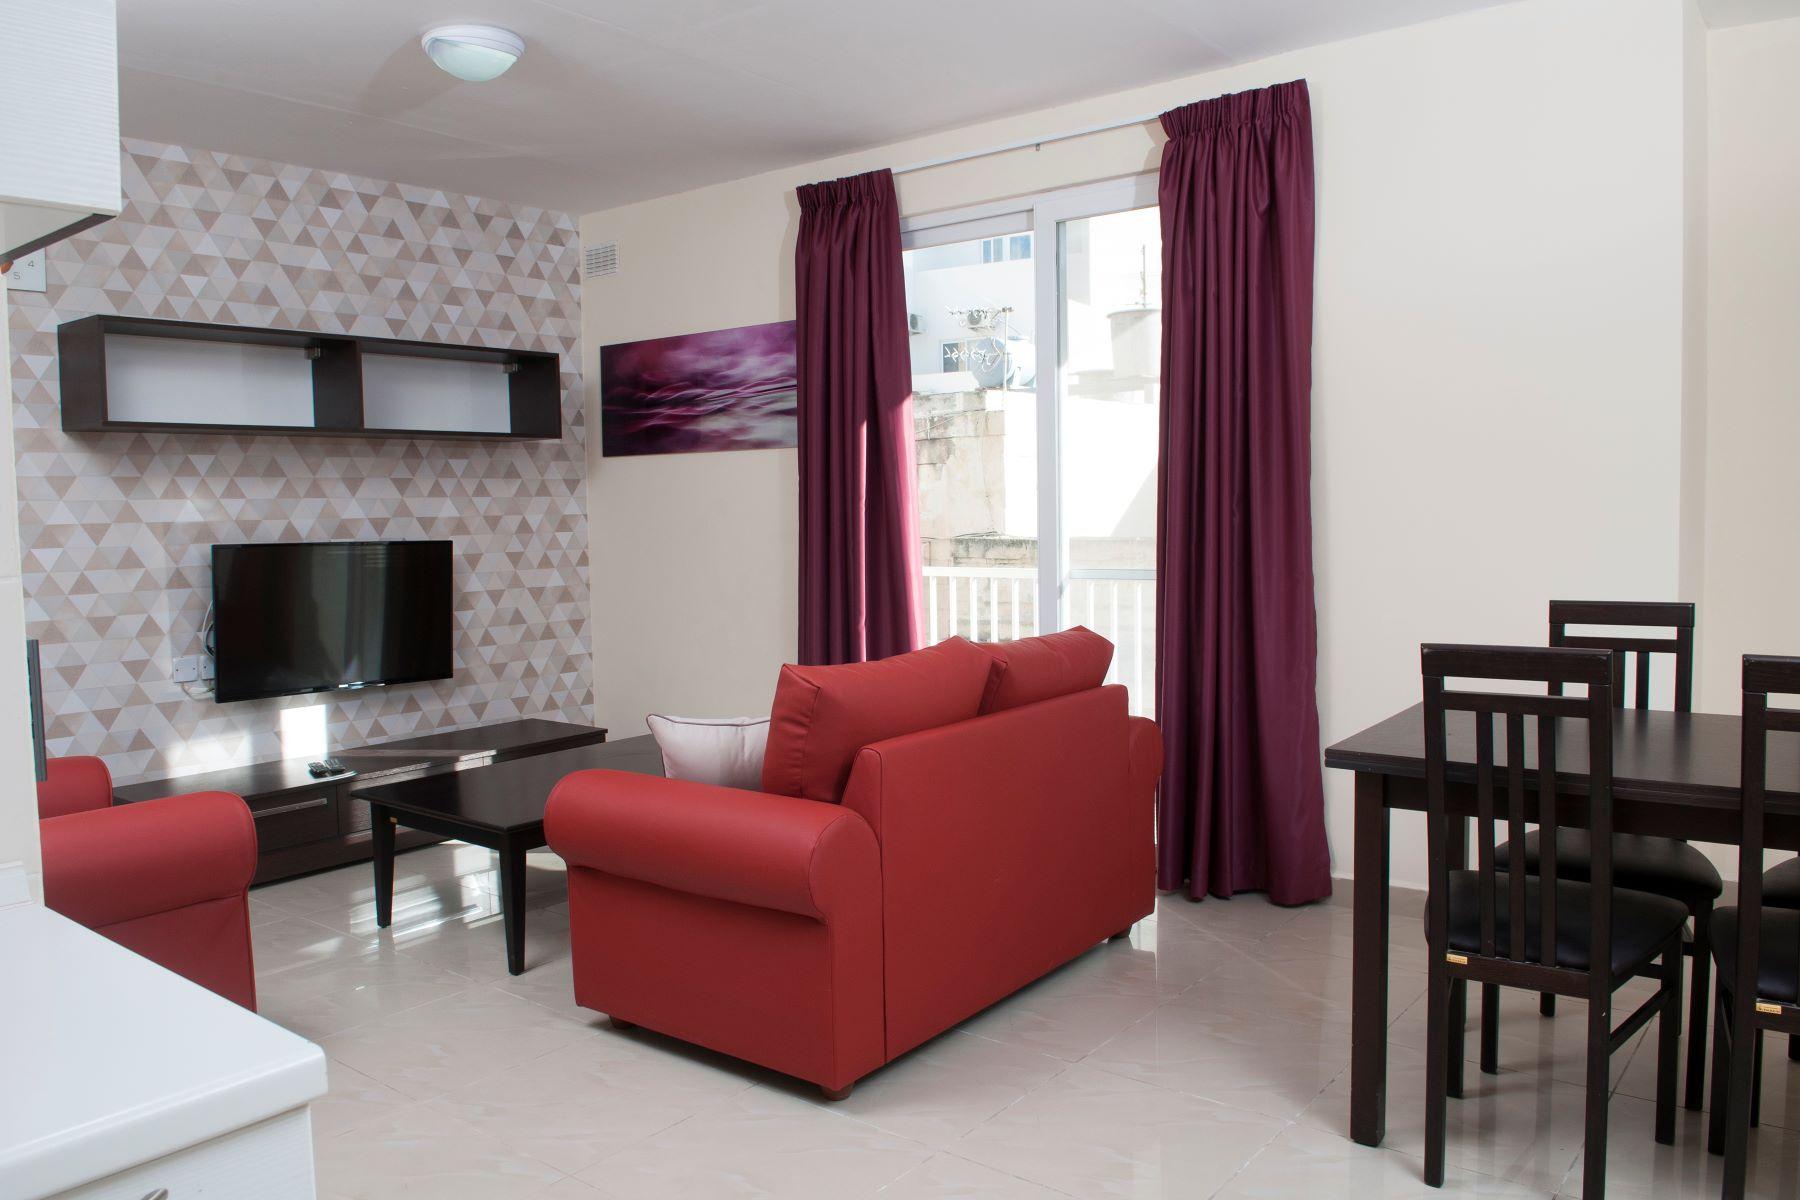 Apartment for Rent at Modern Apartment Sliema, Malta Malta